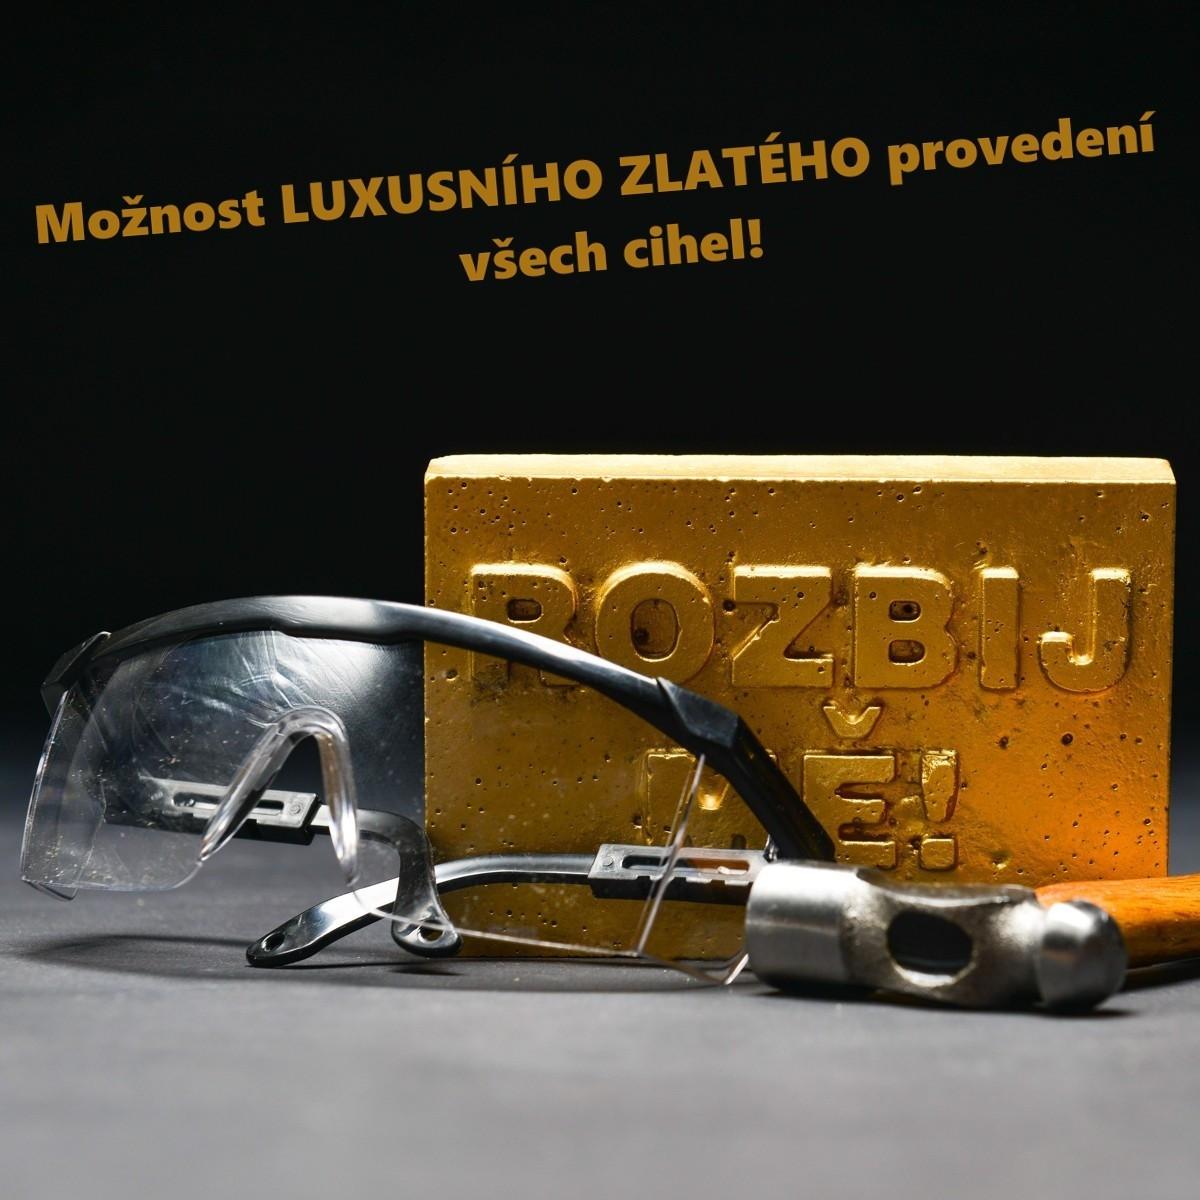 zlata.jpg